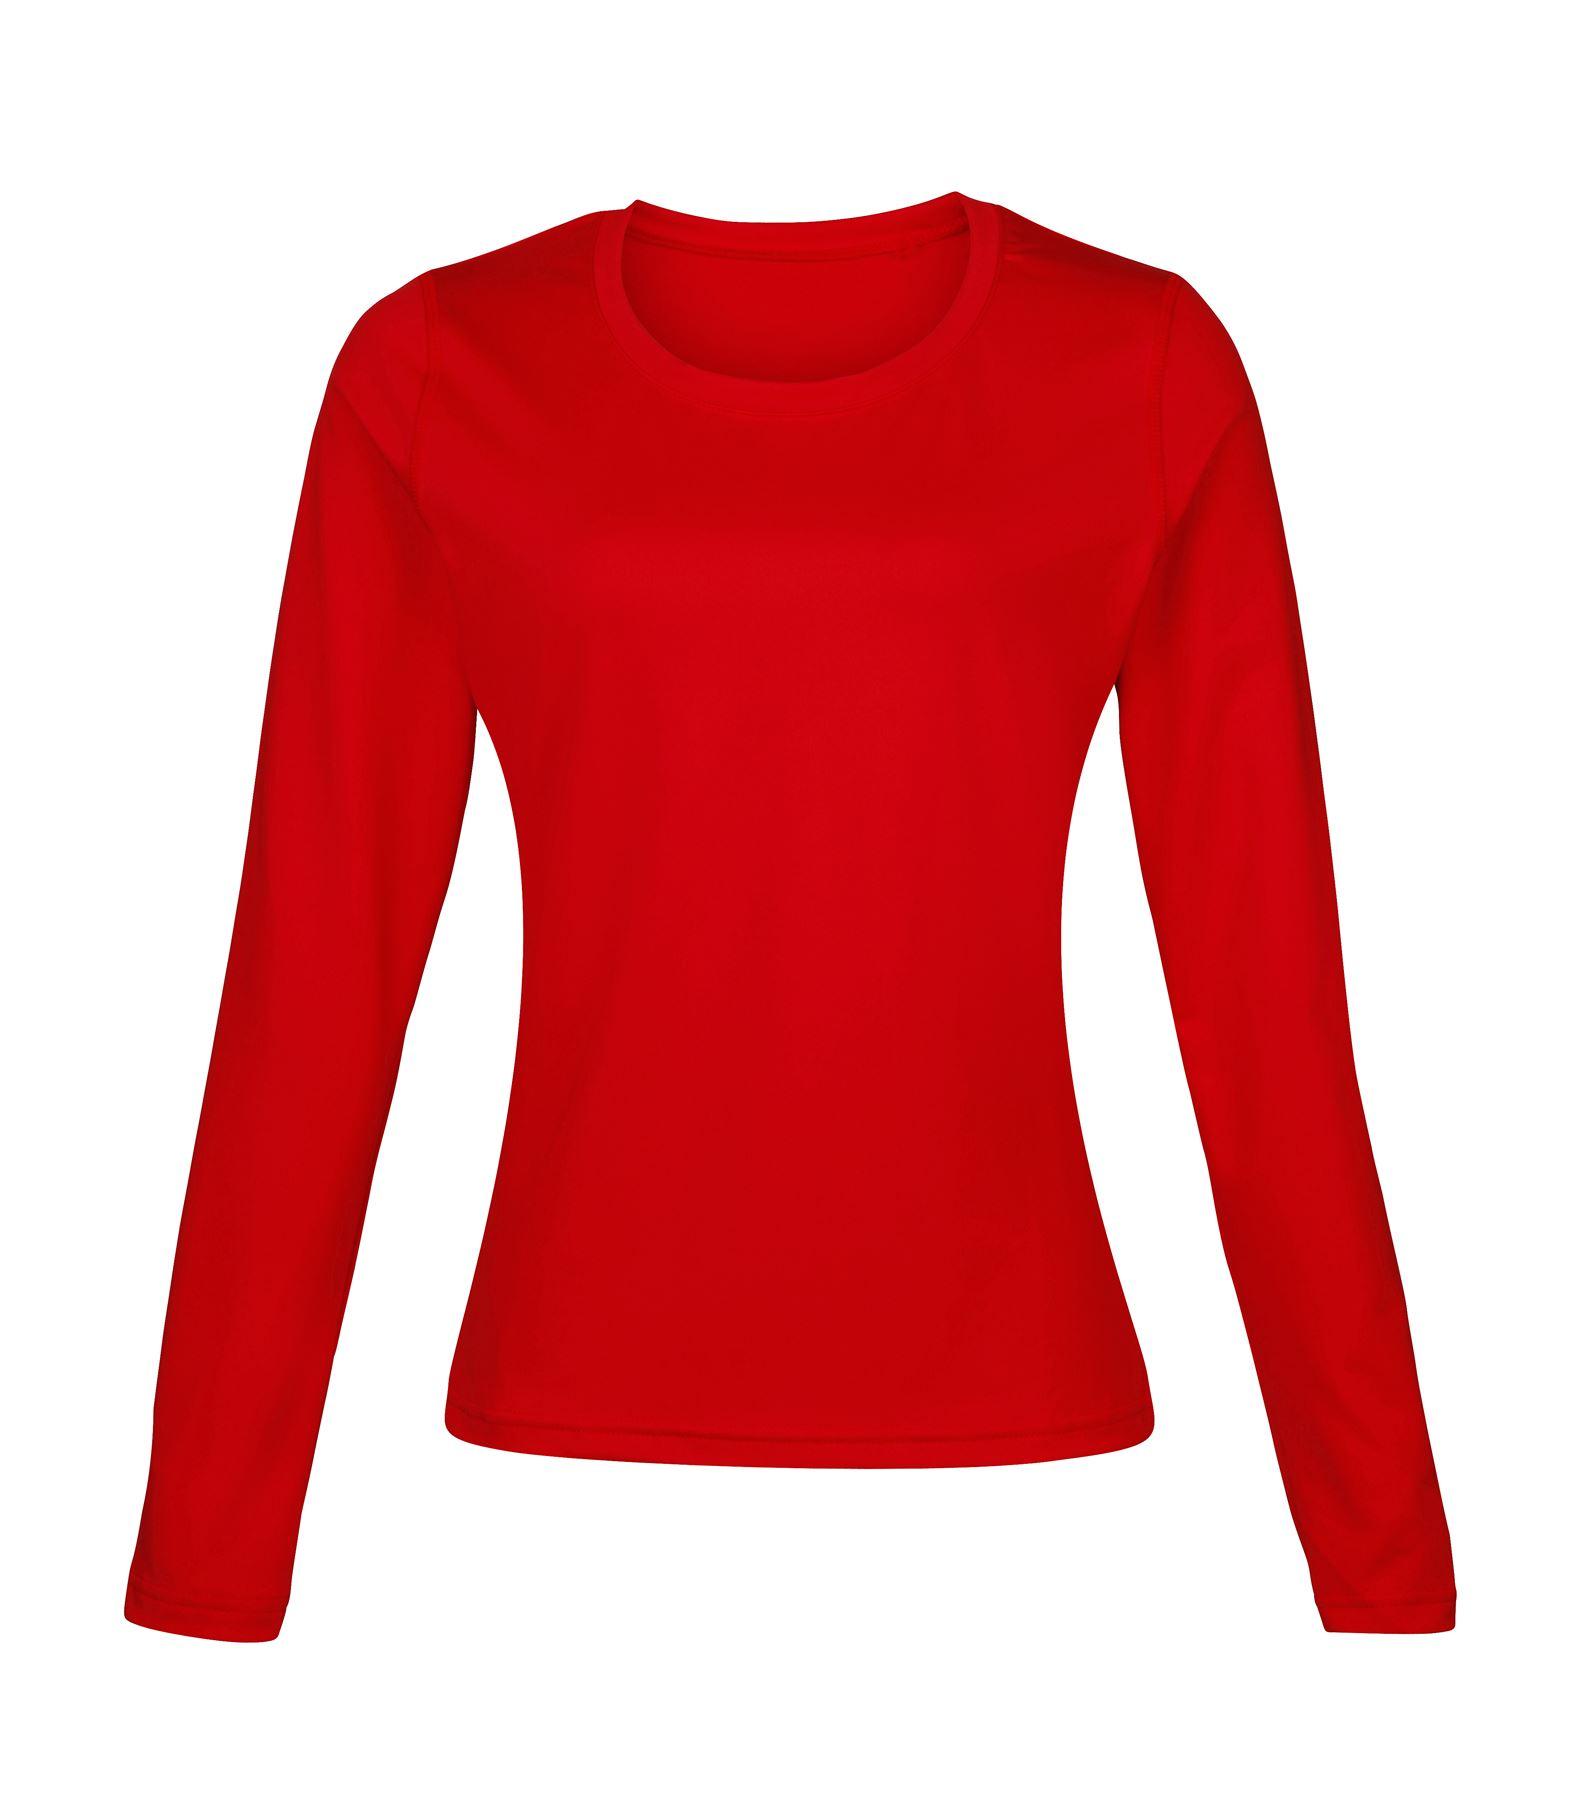 Rhino thermal wear womens rhino base layer long sleeve t for Womens base layer shirt